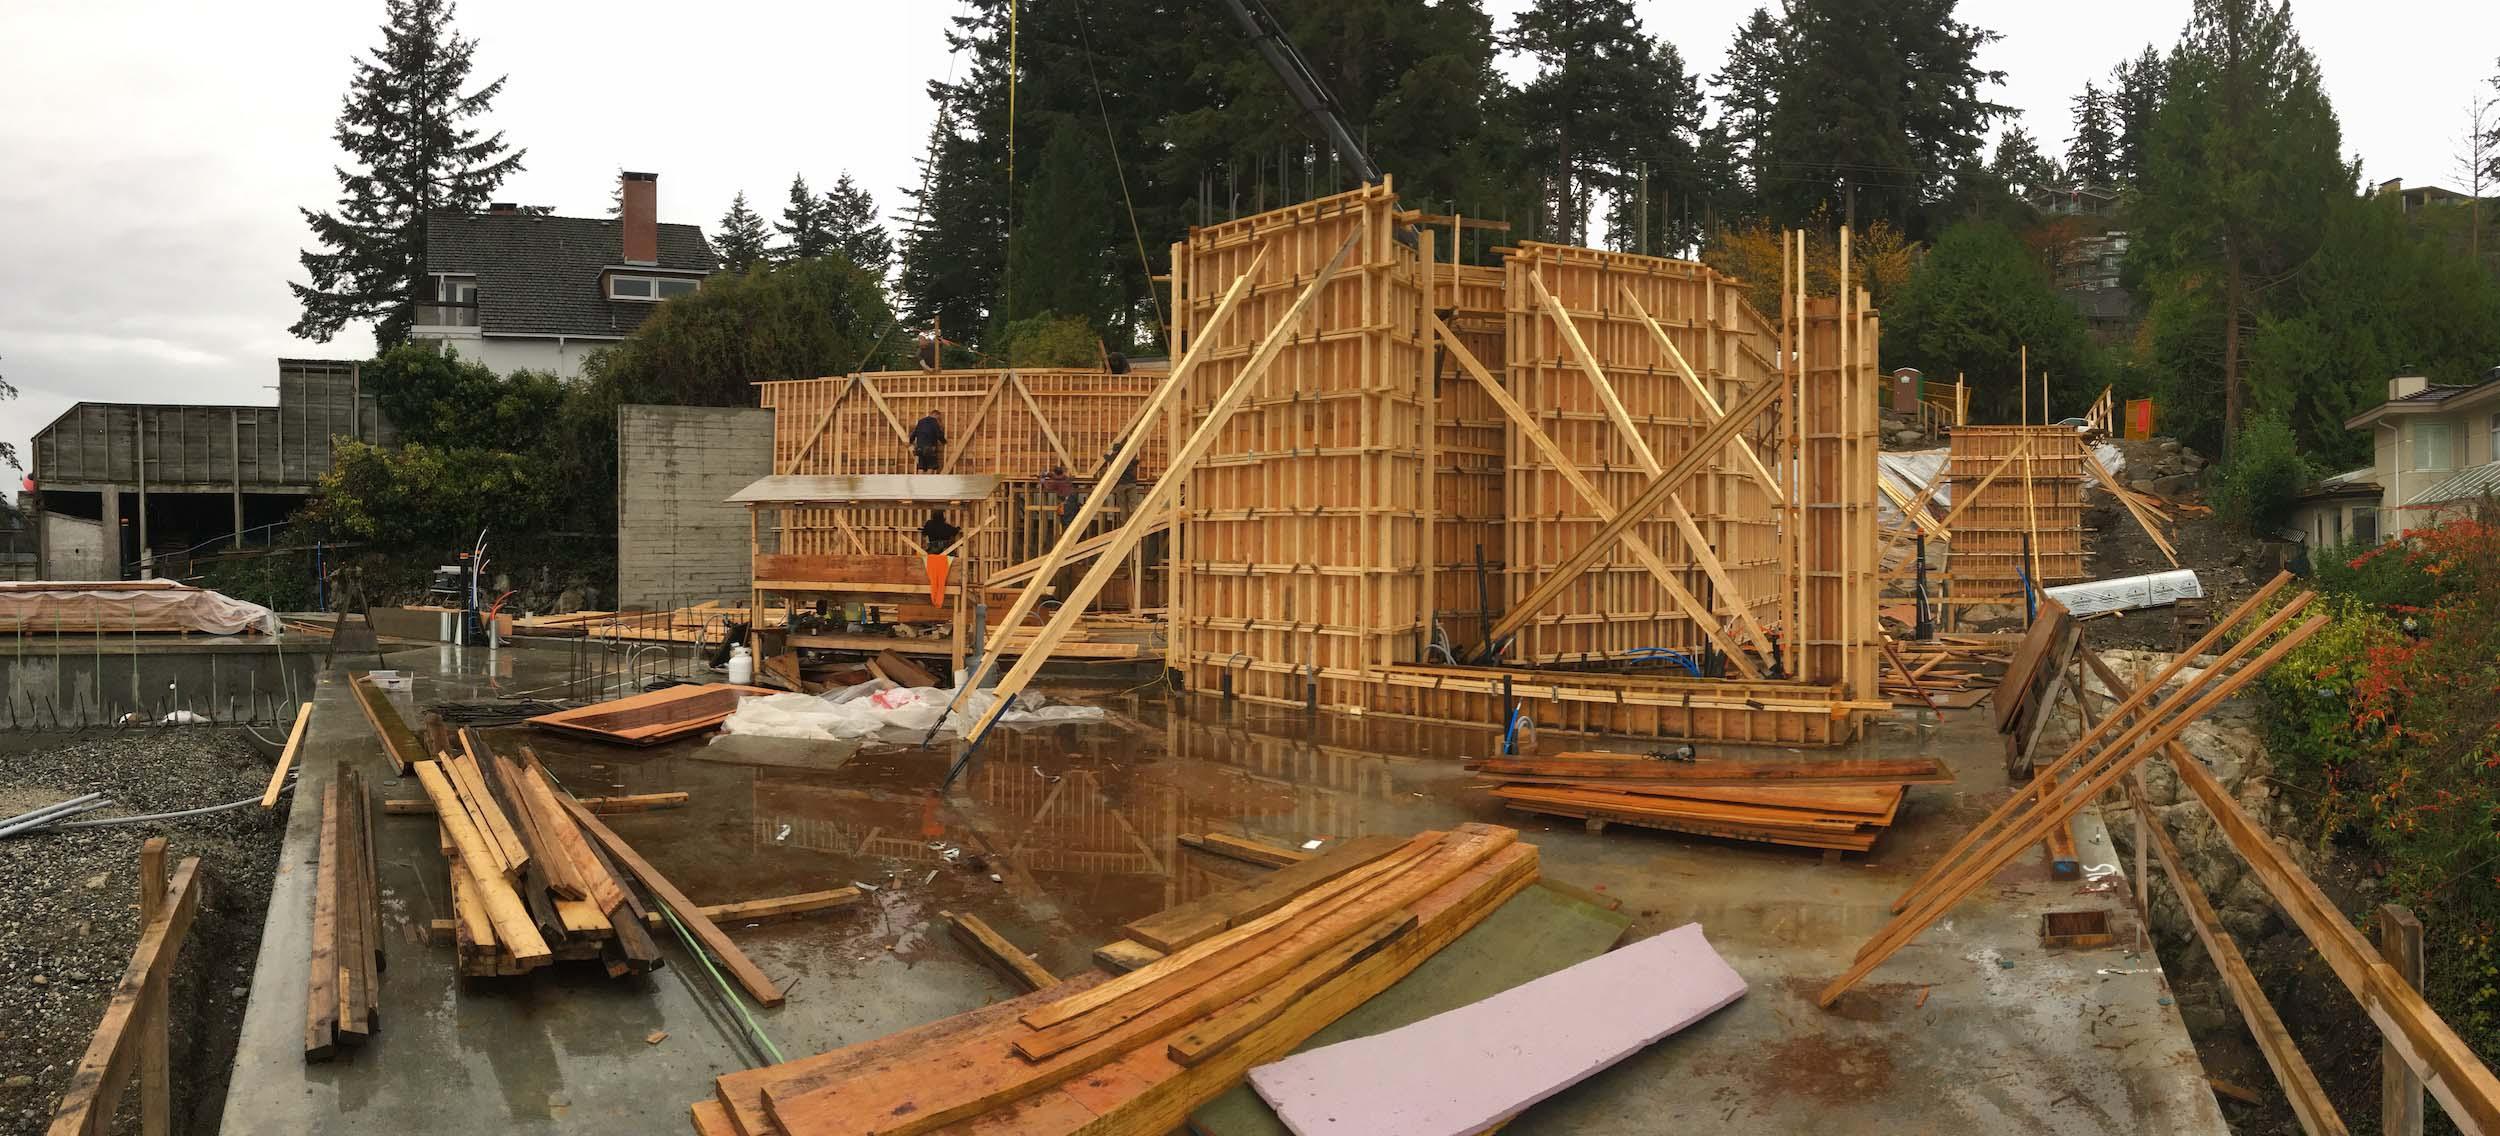 Postle_Construction_ConcreteForming25.jpg